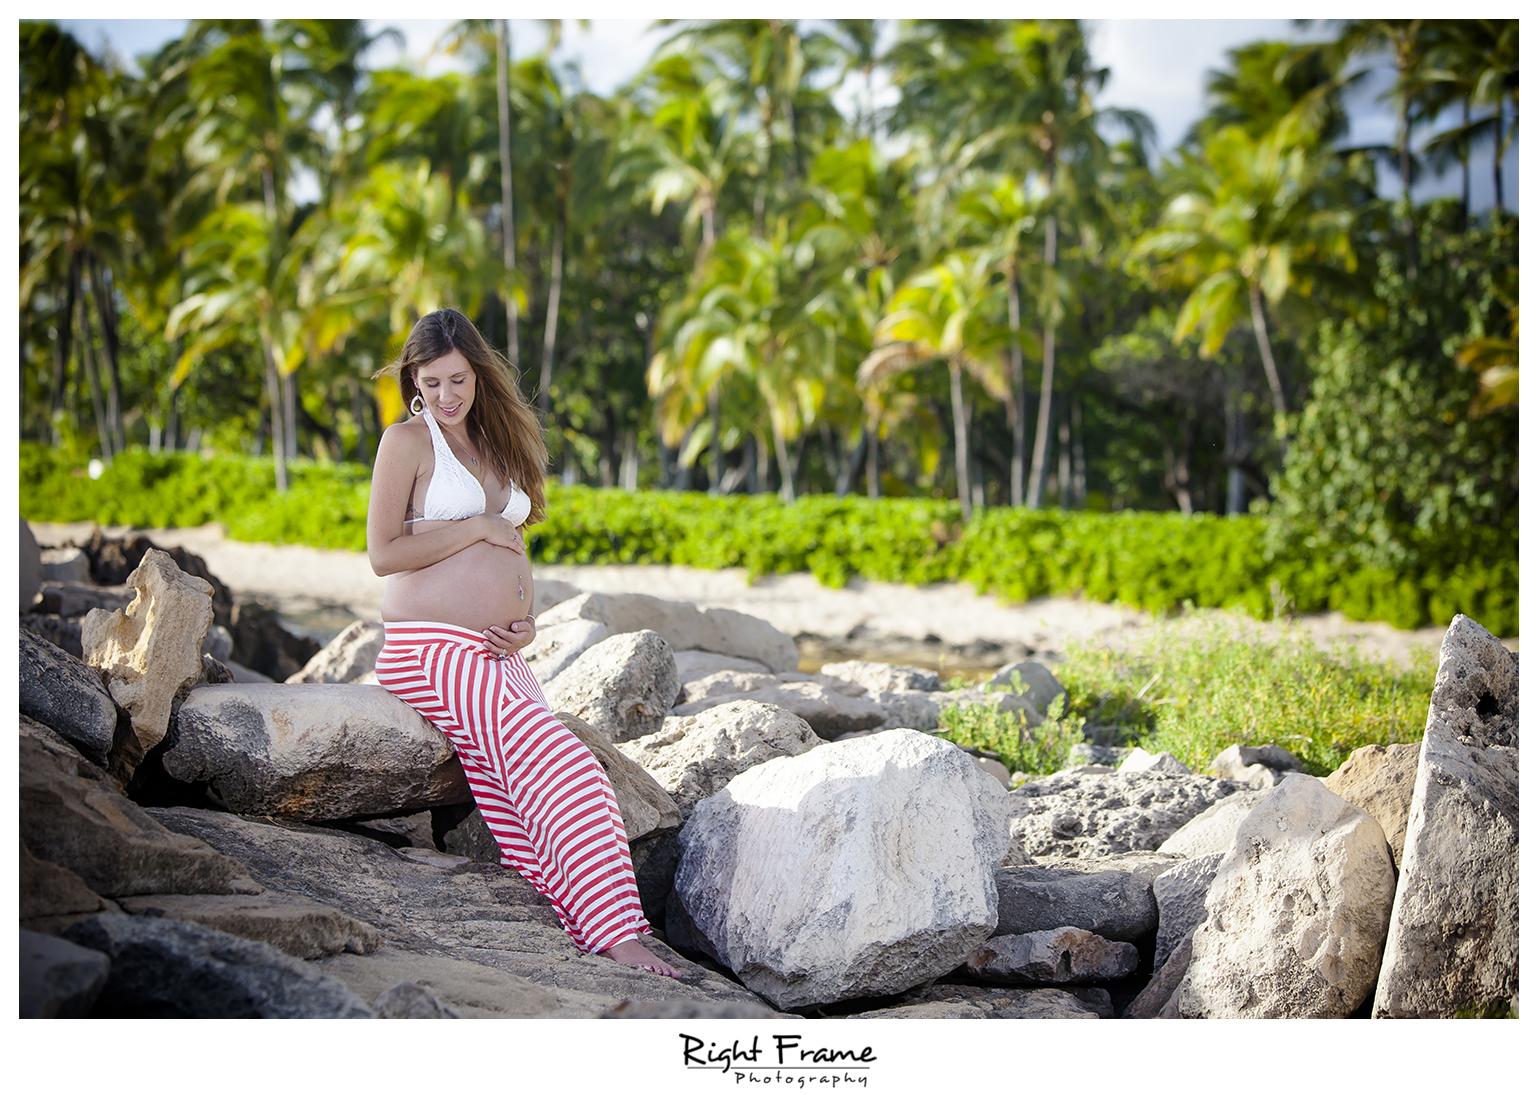 003_Honolulu_Maternity_Photography